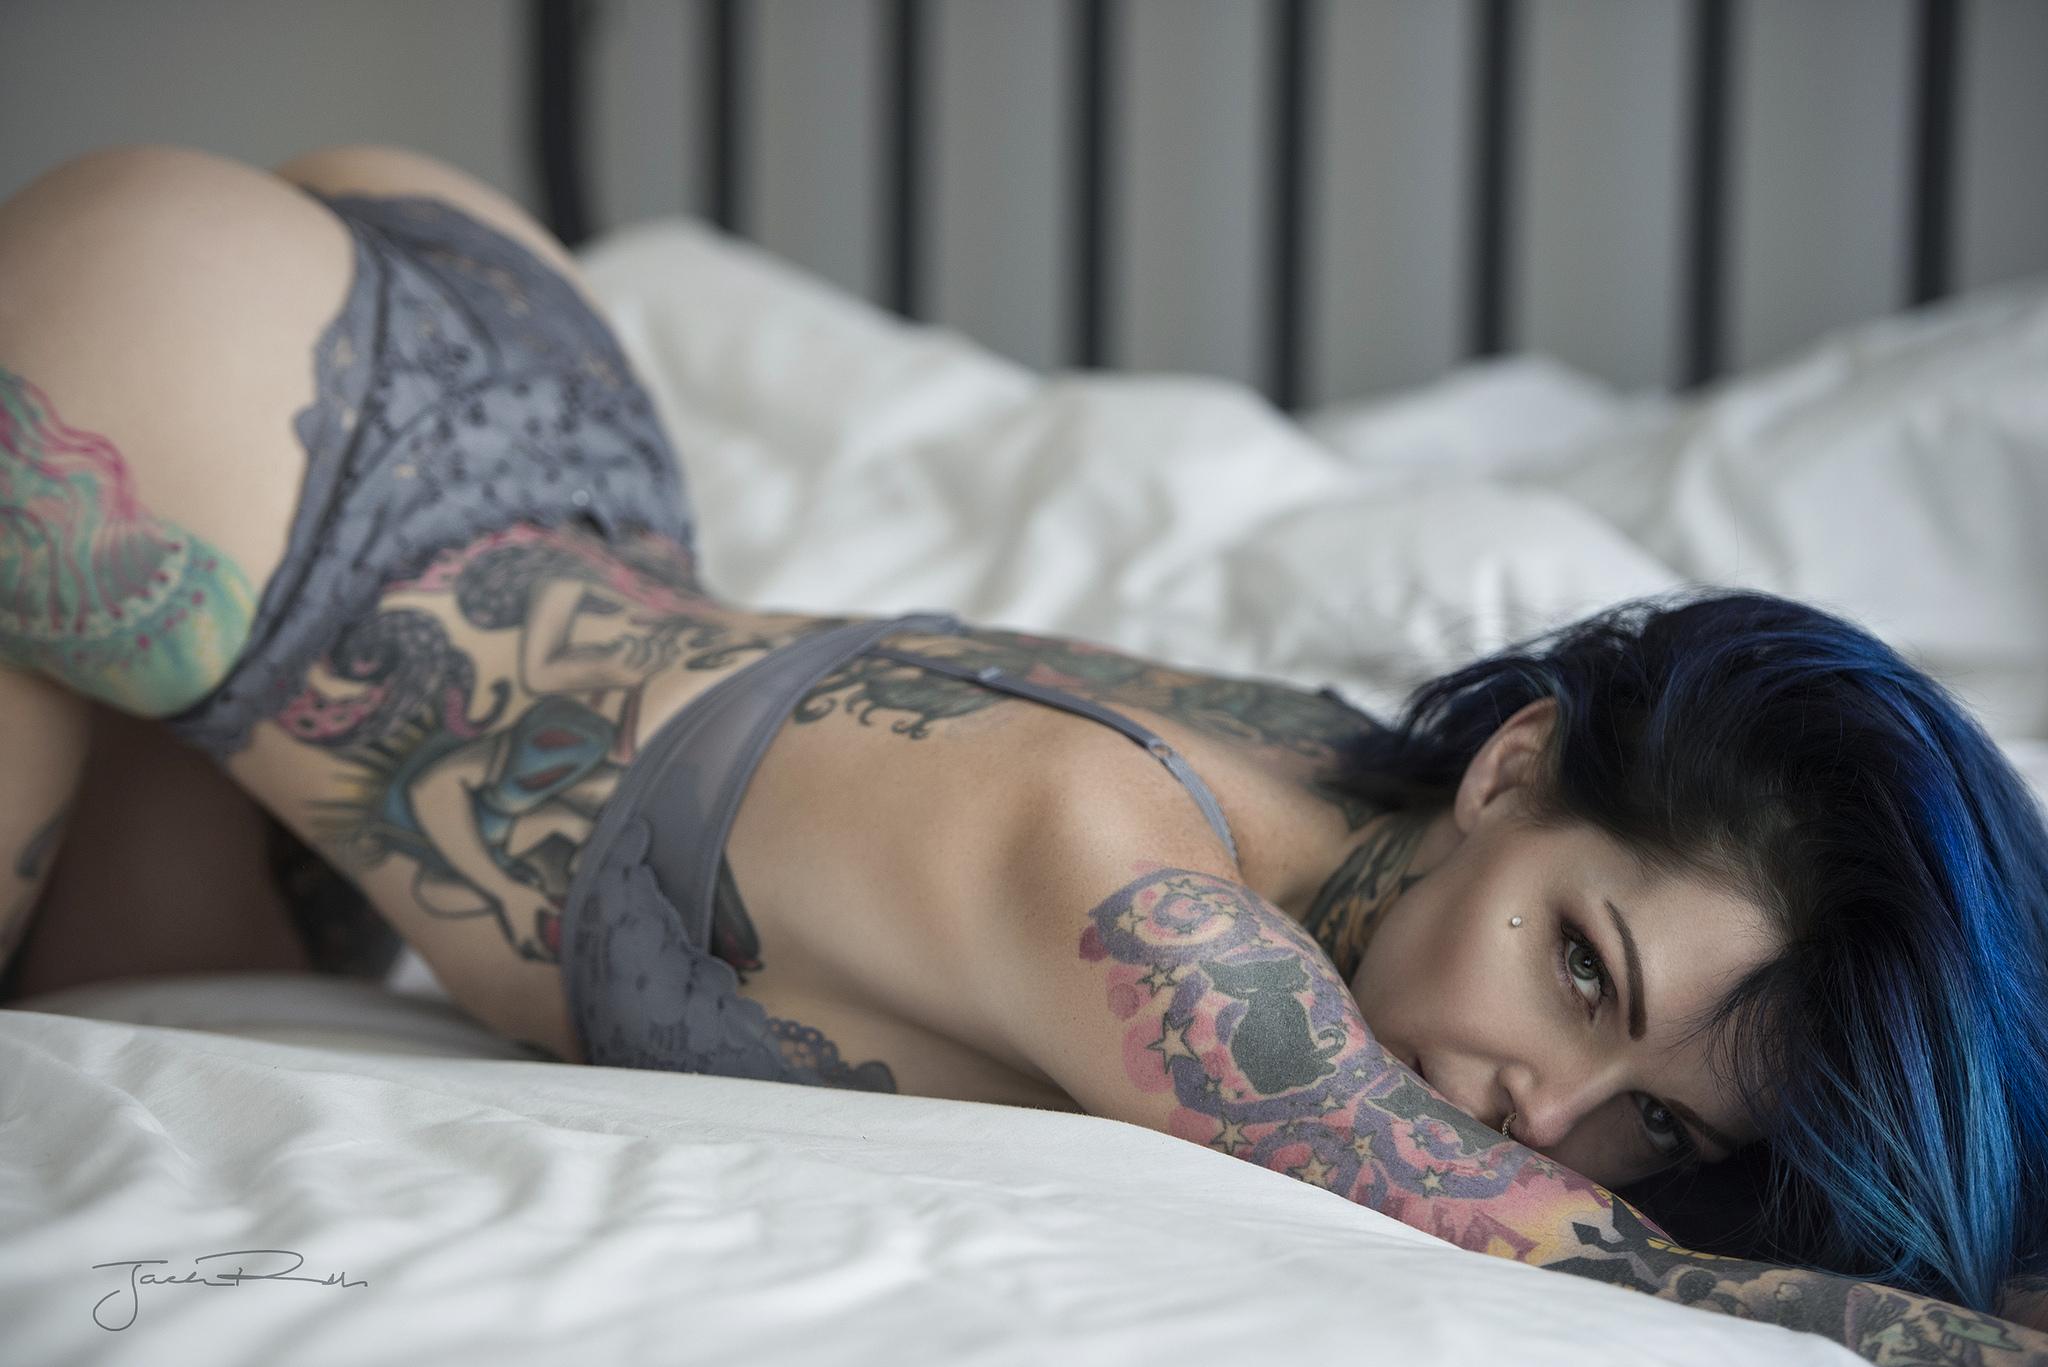 Amateur Naked Tattooed Women